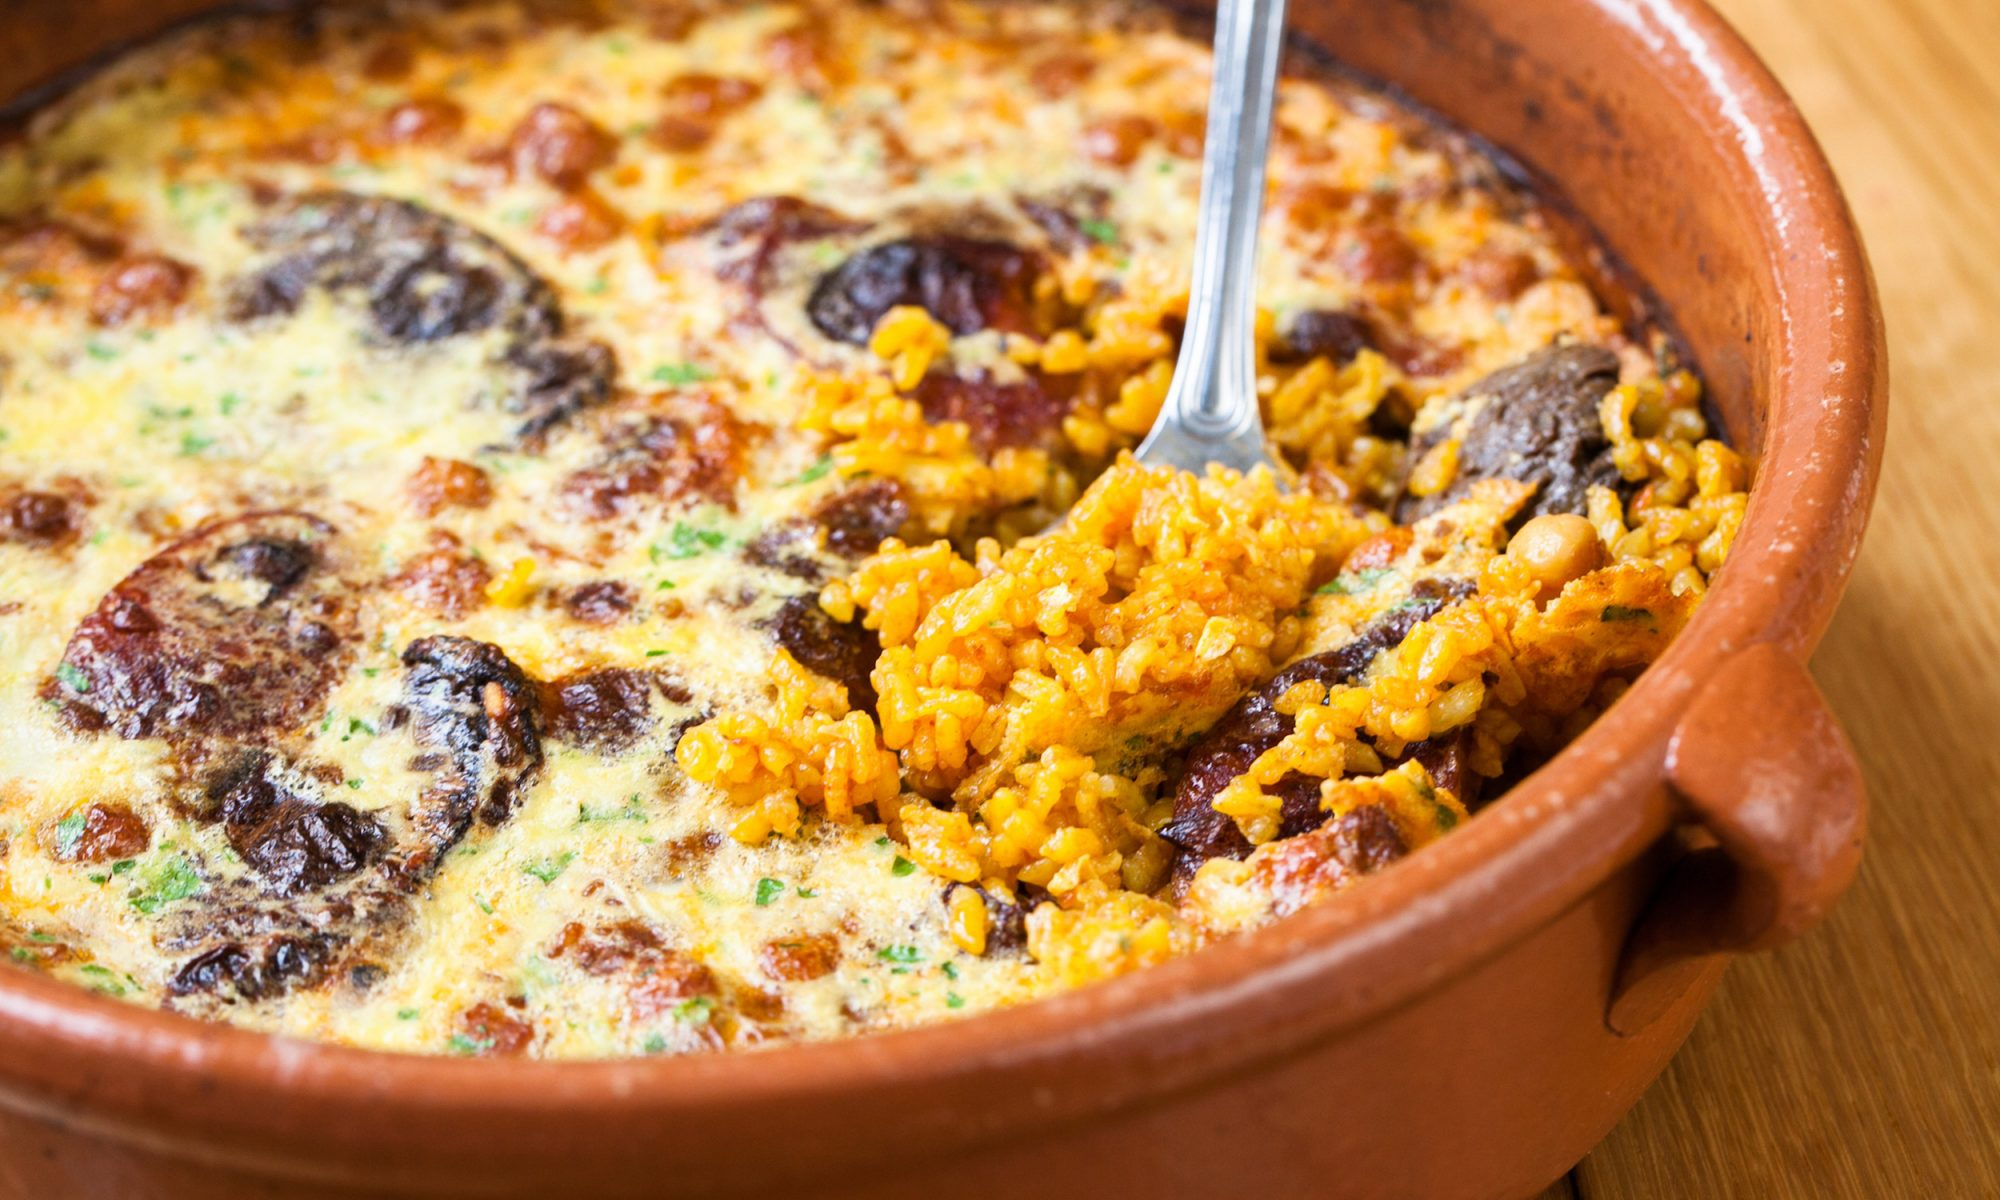 EC: Frittata + Rice Casserole = Breakfast Paella